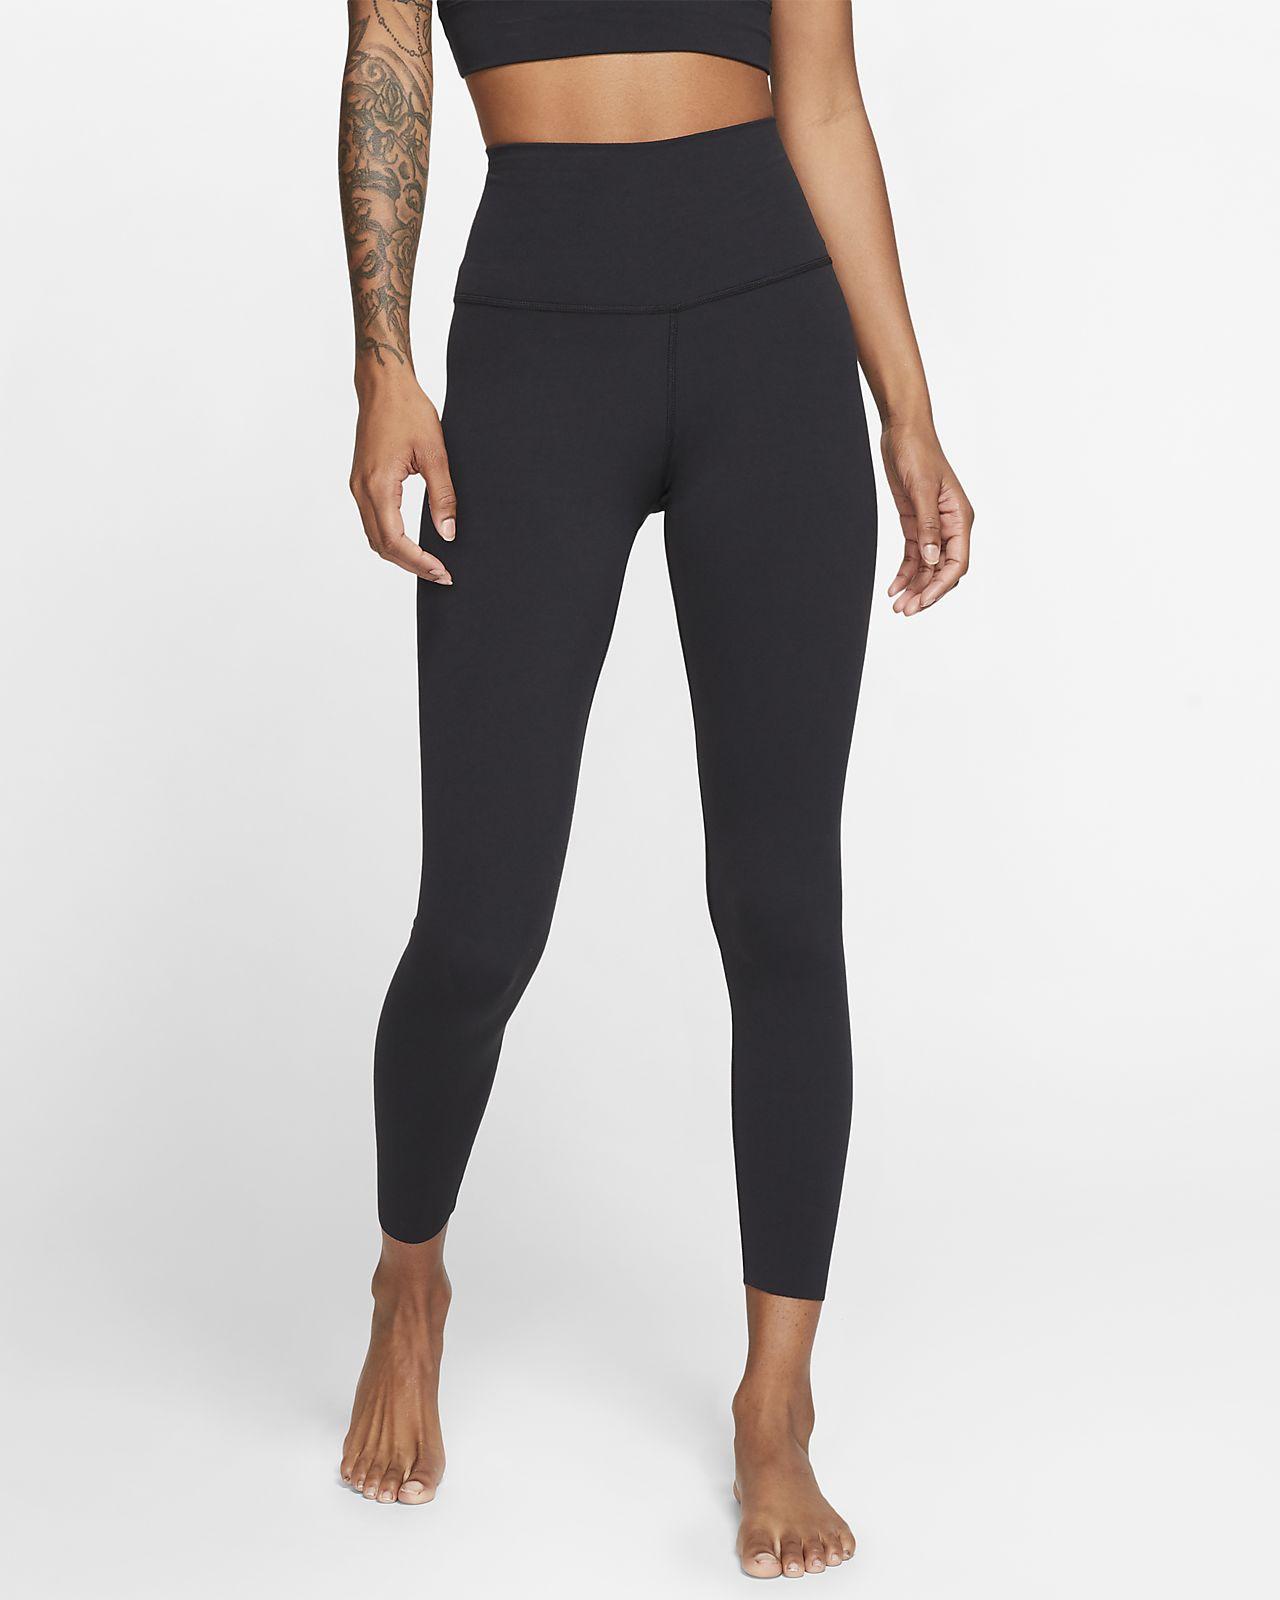 Nike Yoga Luxe 女款 Infinalon 九分緊身褲